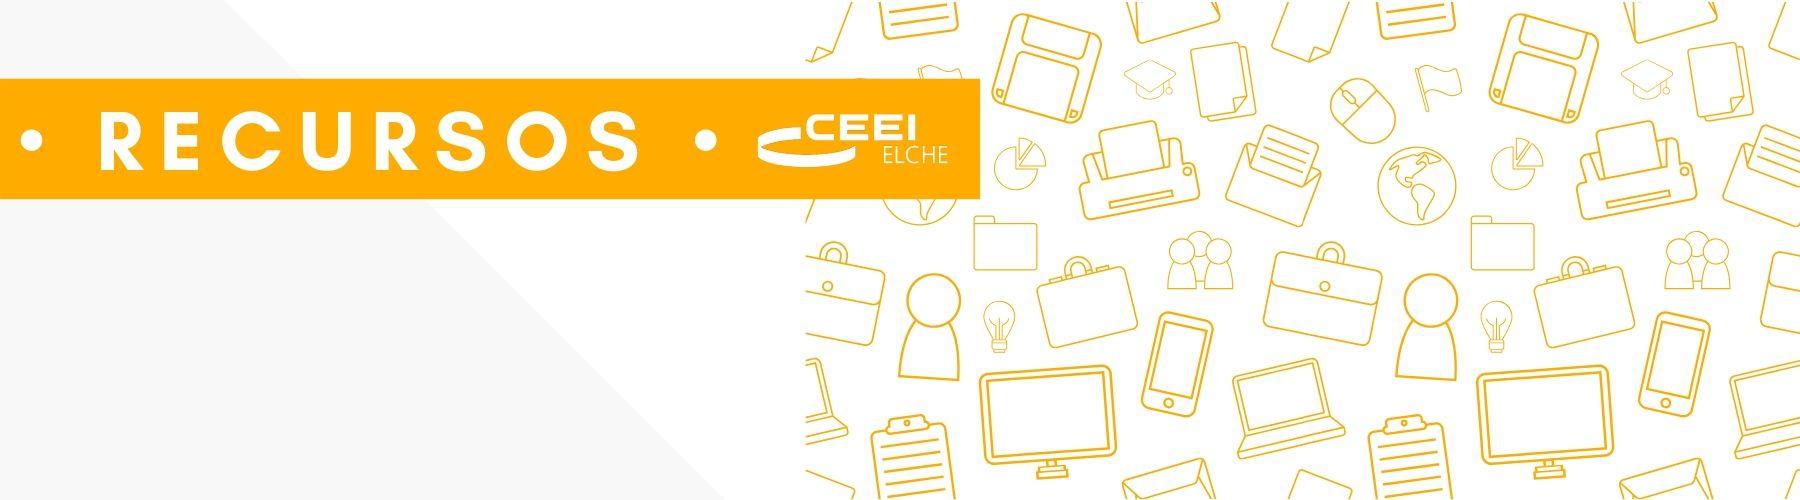 Botones Página recursos CEEI Elche Naranjitos (9)[;;;][;;;]